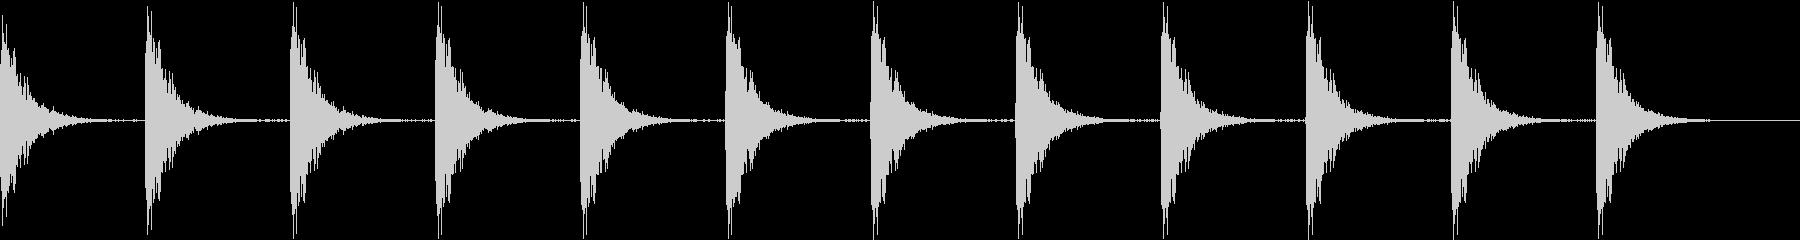 Kitchen ガスコンロの点火音 1の未再生の波形